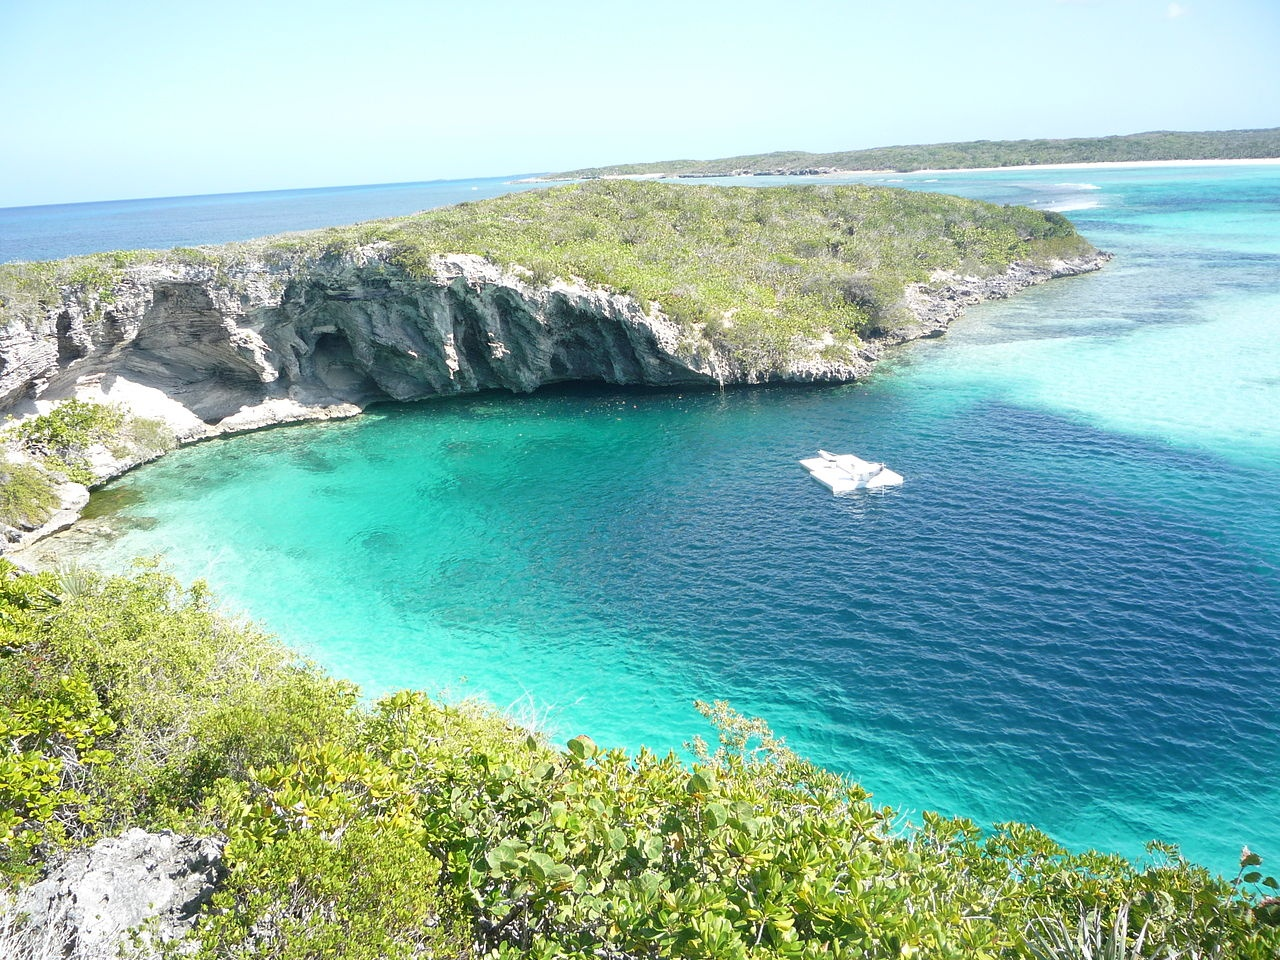 1280px-dean_blue_hole_long_island_bahamas_20110210